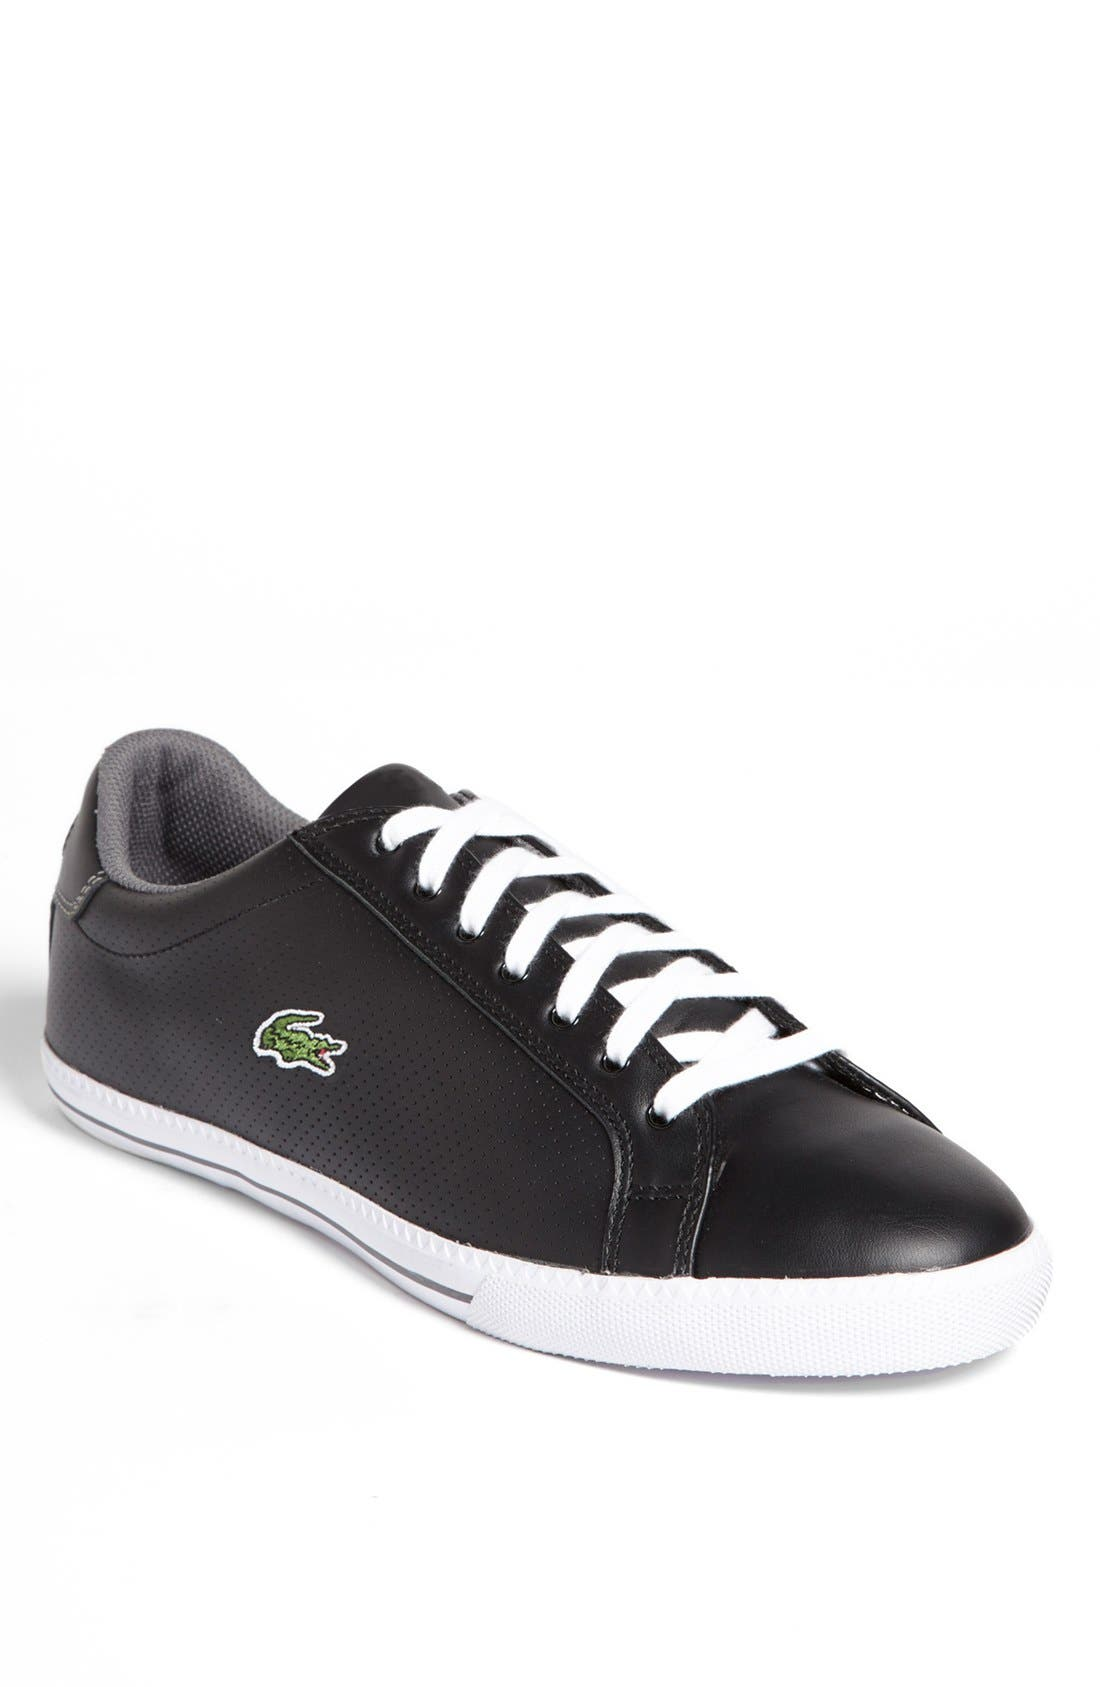 Main Image - Lacoste 'Graduate' Sneaker